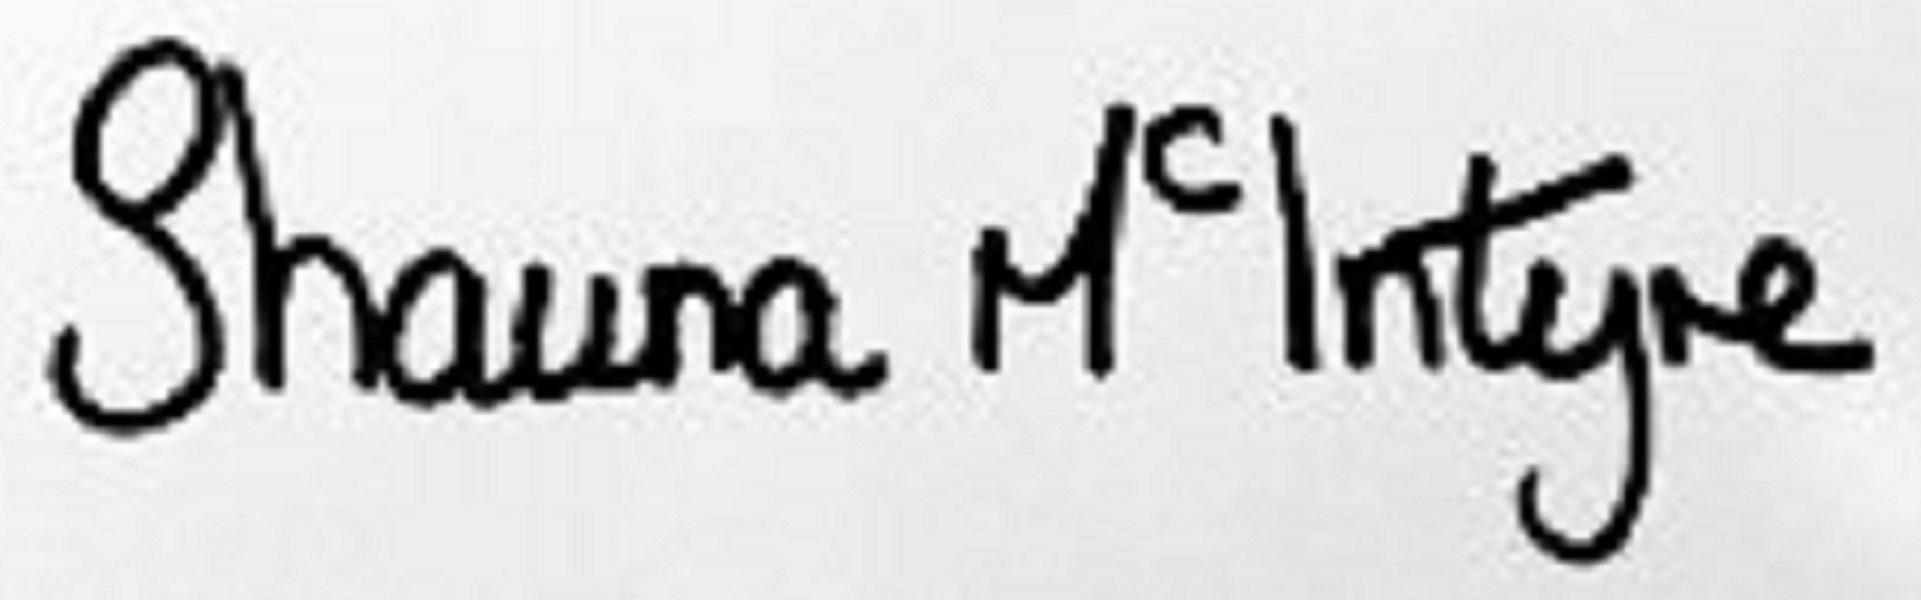 Shauna McIntyre's Signature